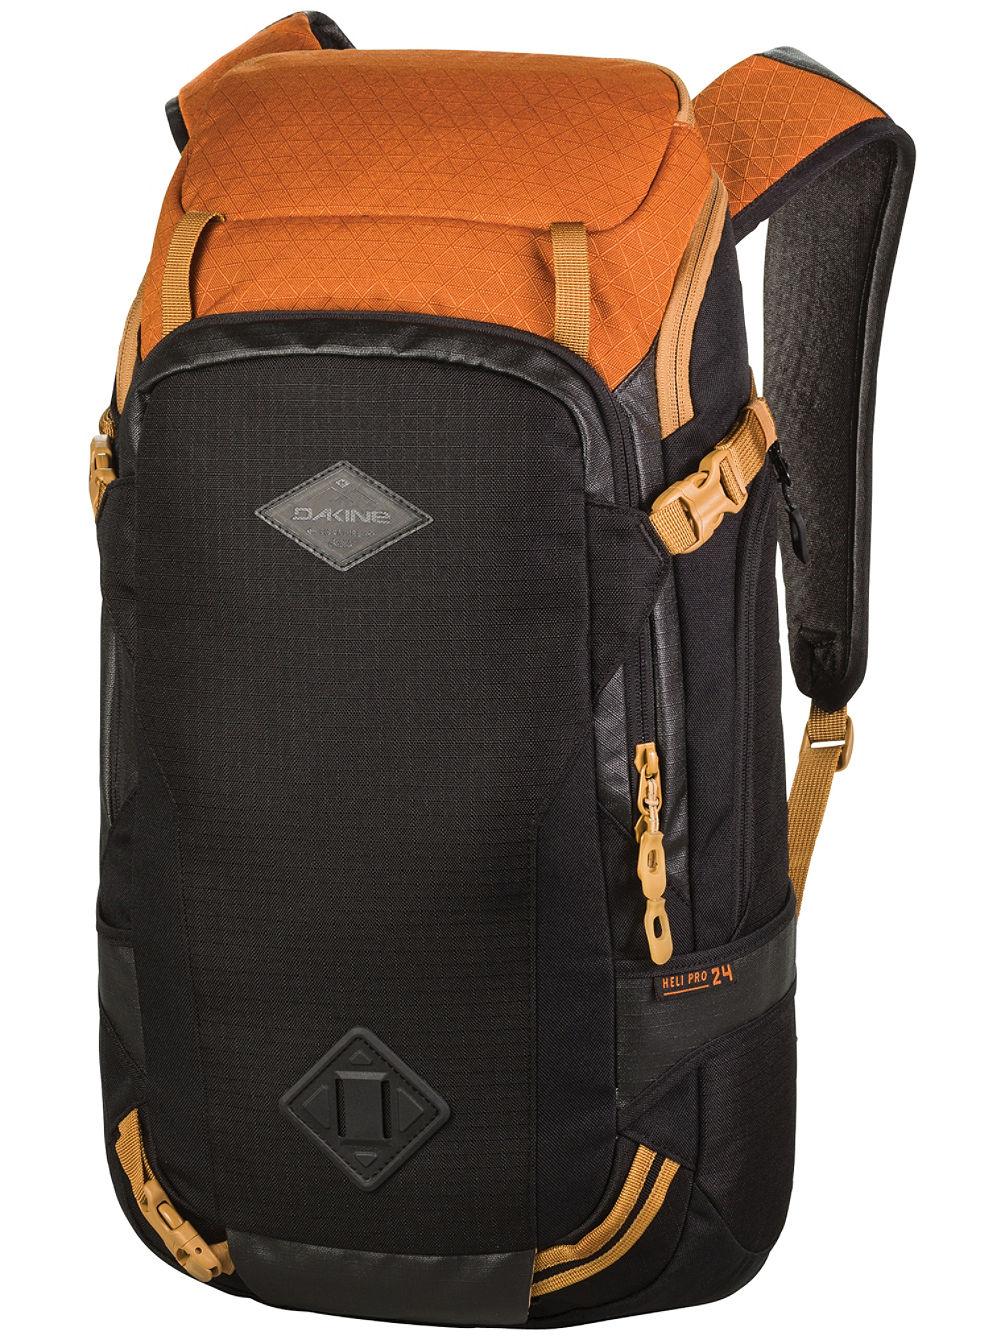 4d684eab2f0e Buy Dakine Team Heli Pro 24L Backpack online at Blue Tomato